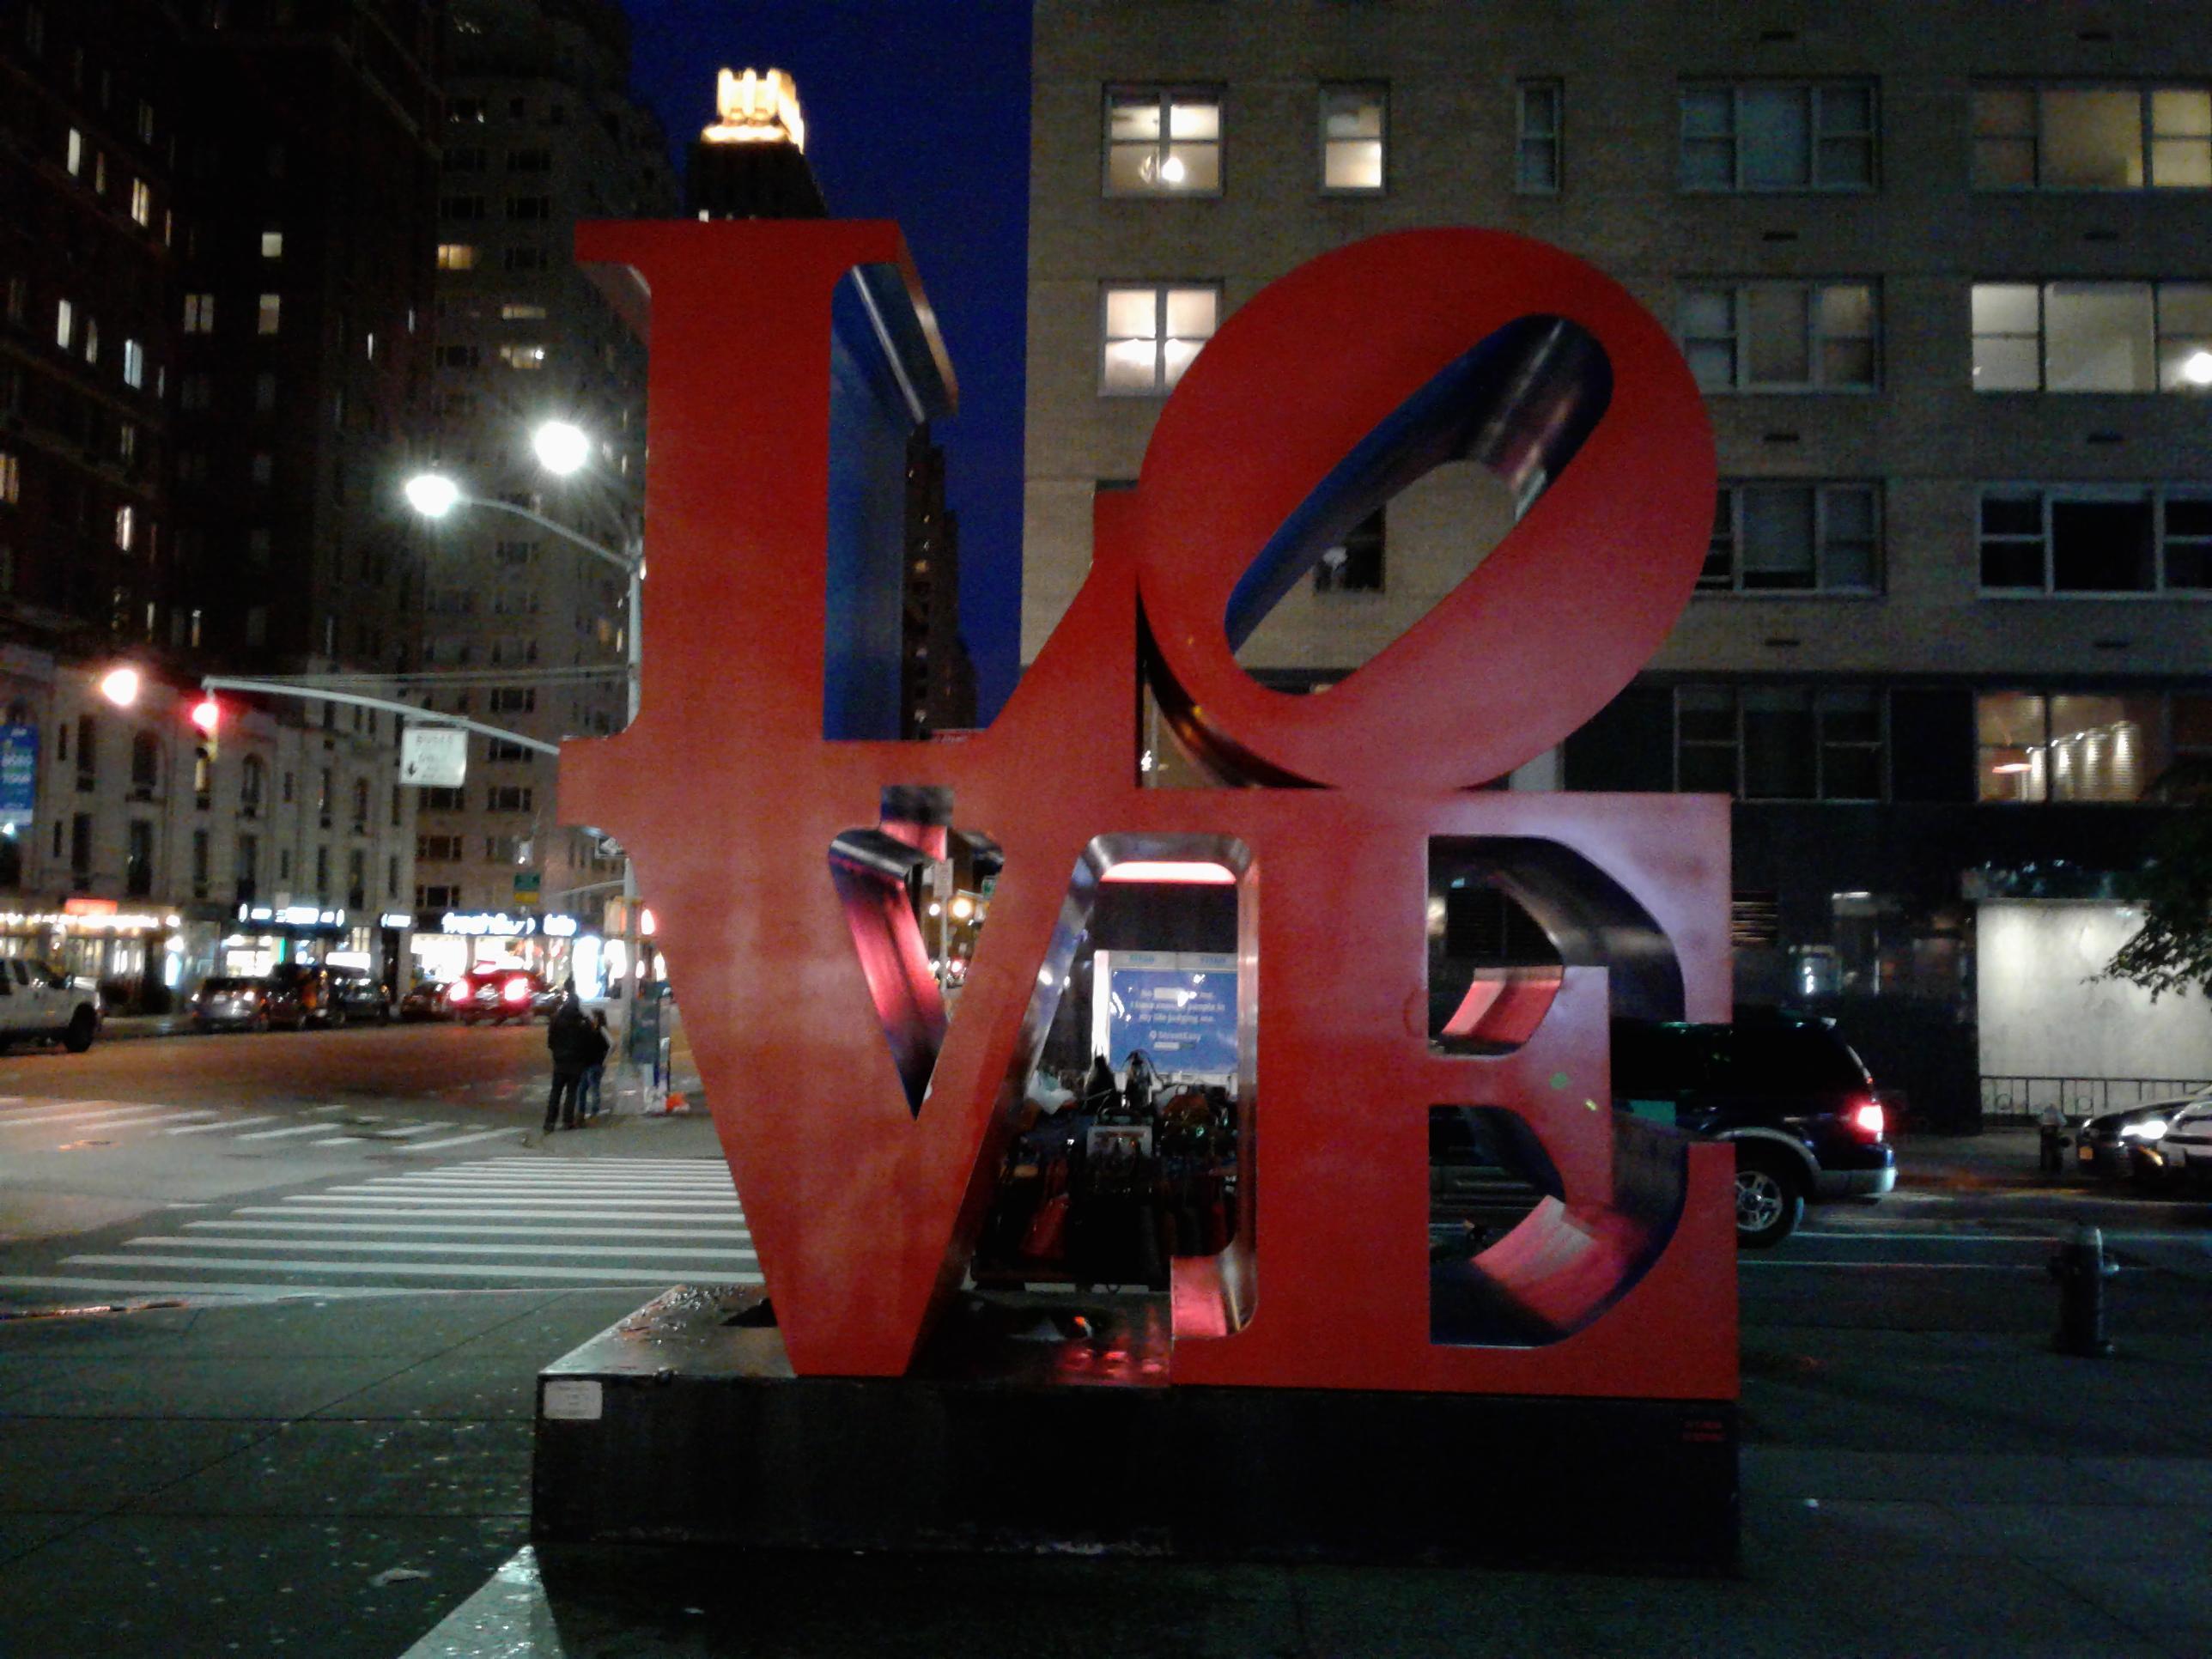 Near MoMA, Broadway, the Park!